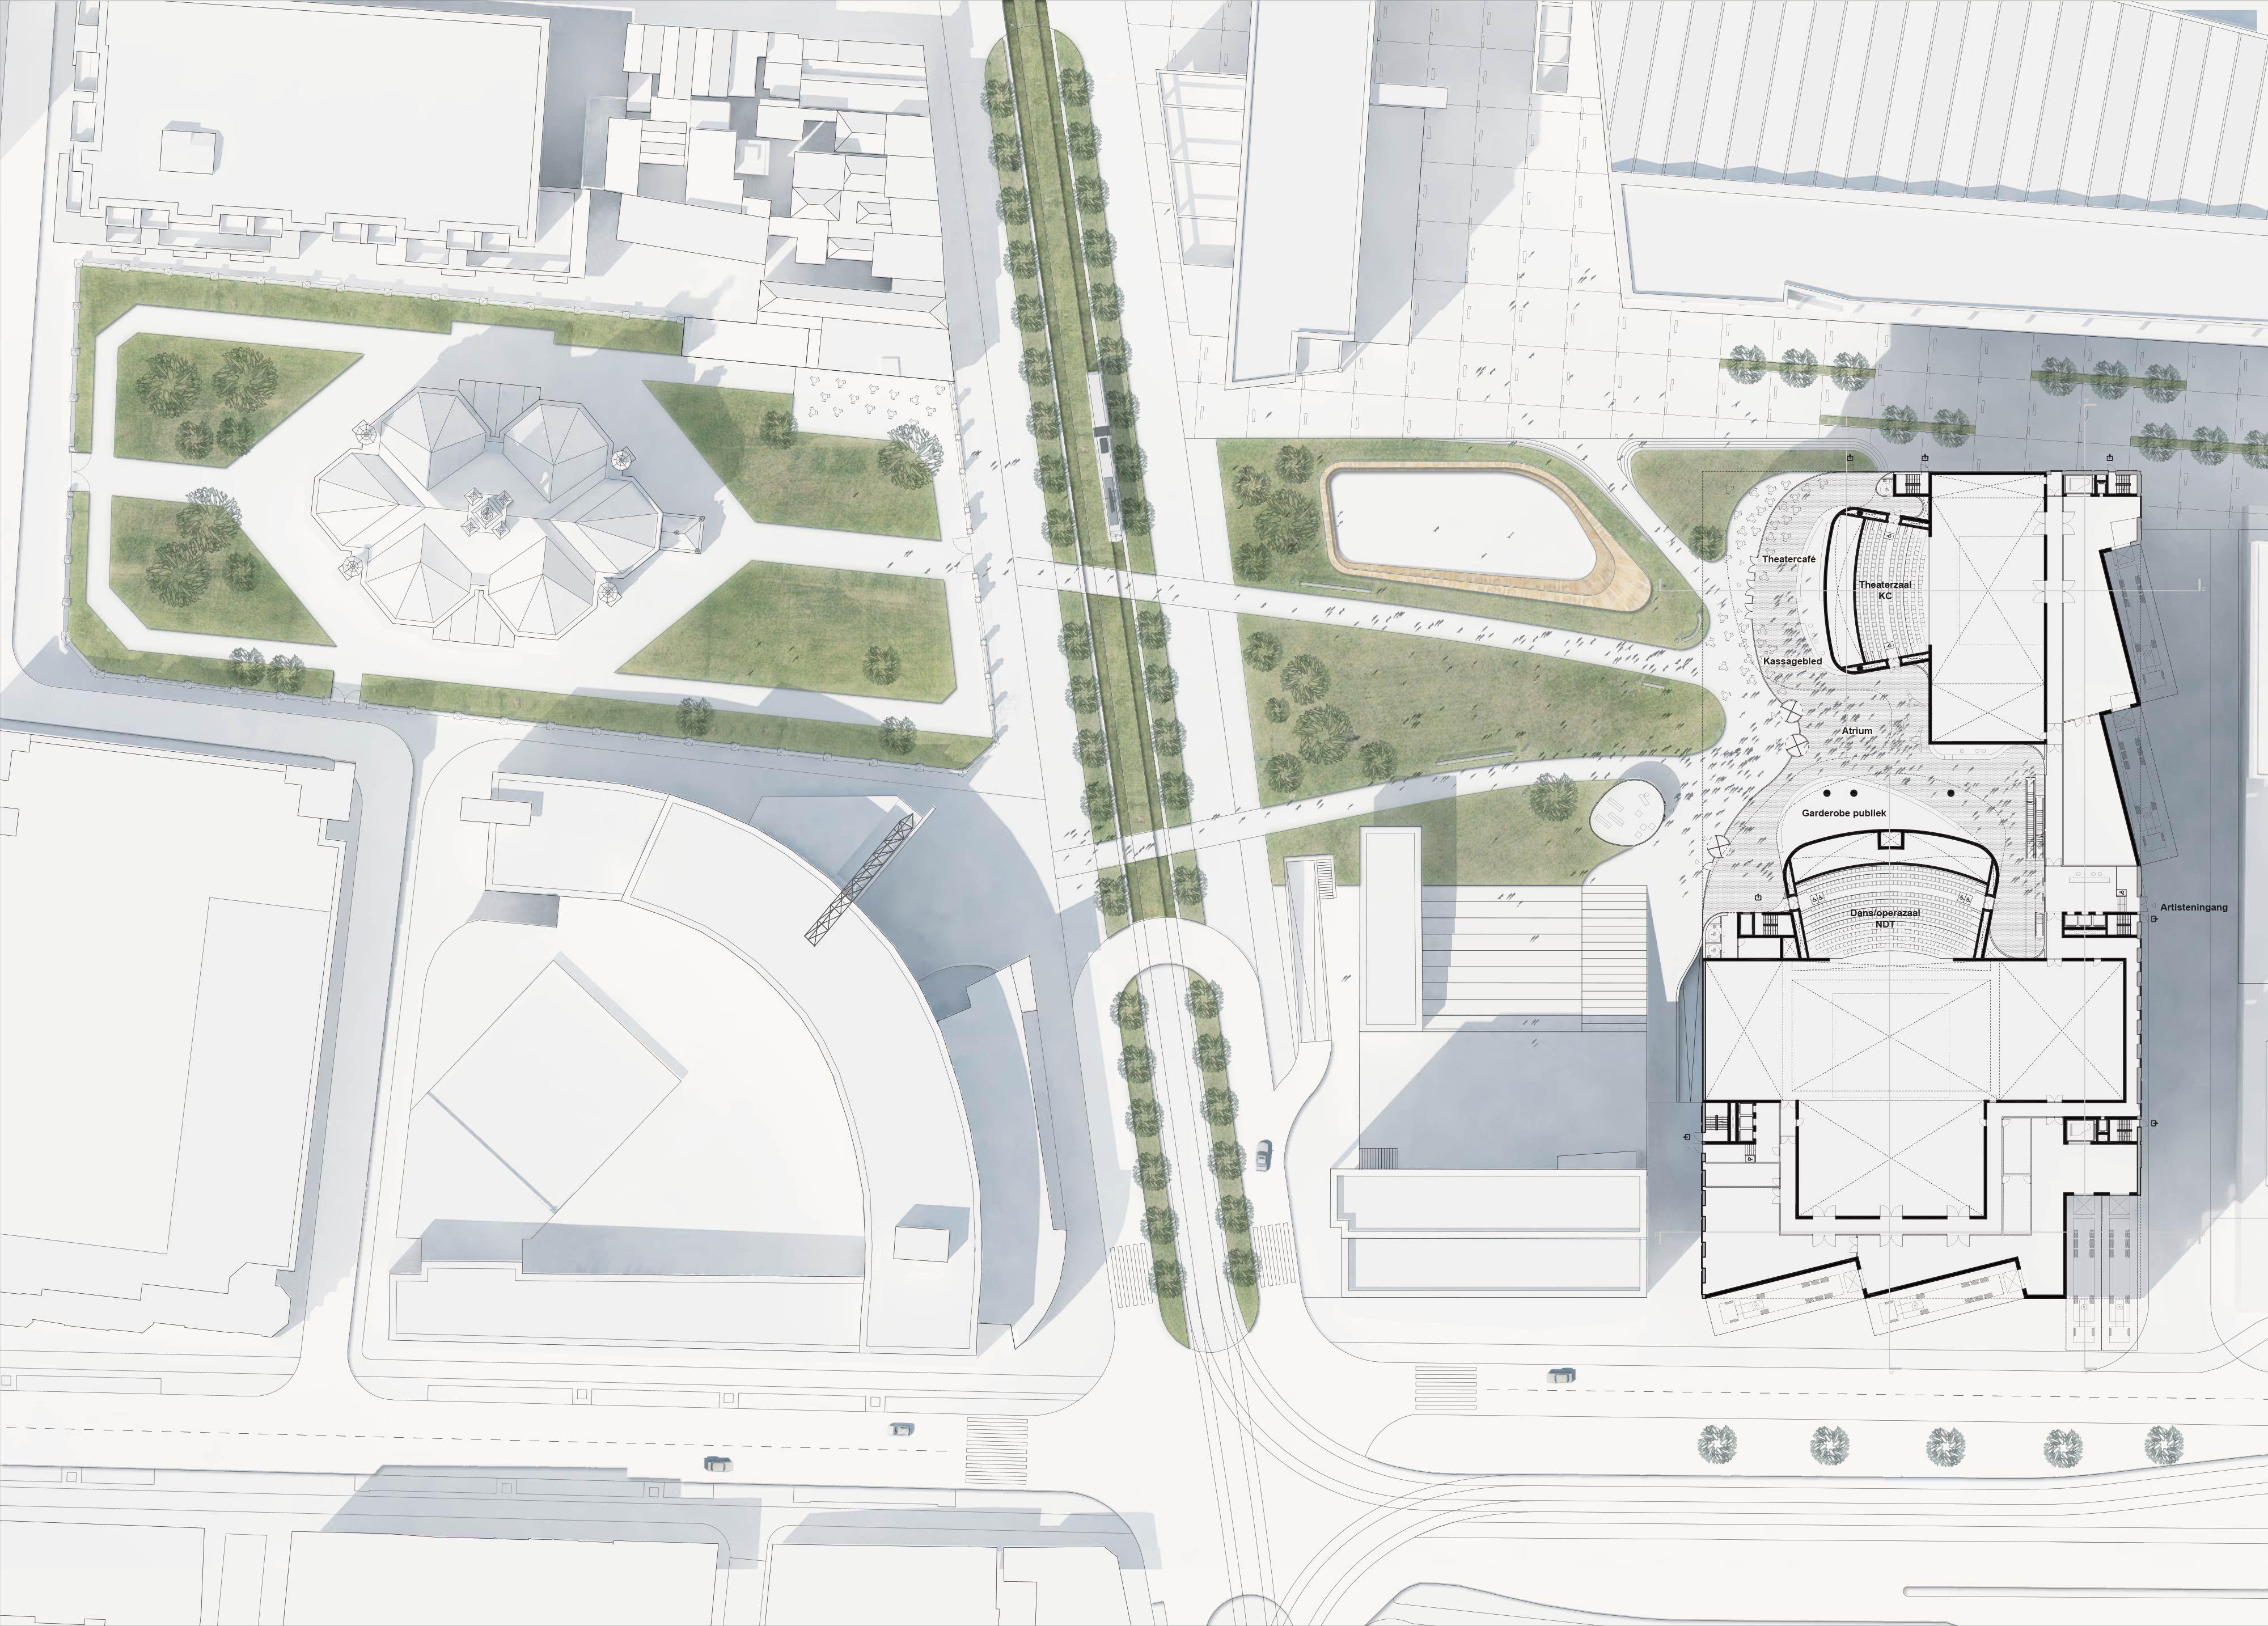 Powerhouse Company DMC The Hague Site Plan Architectural